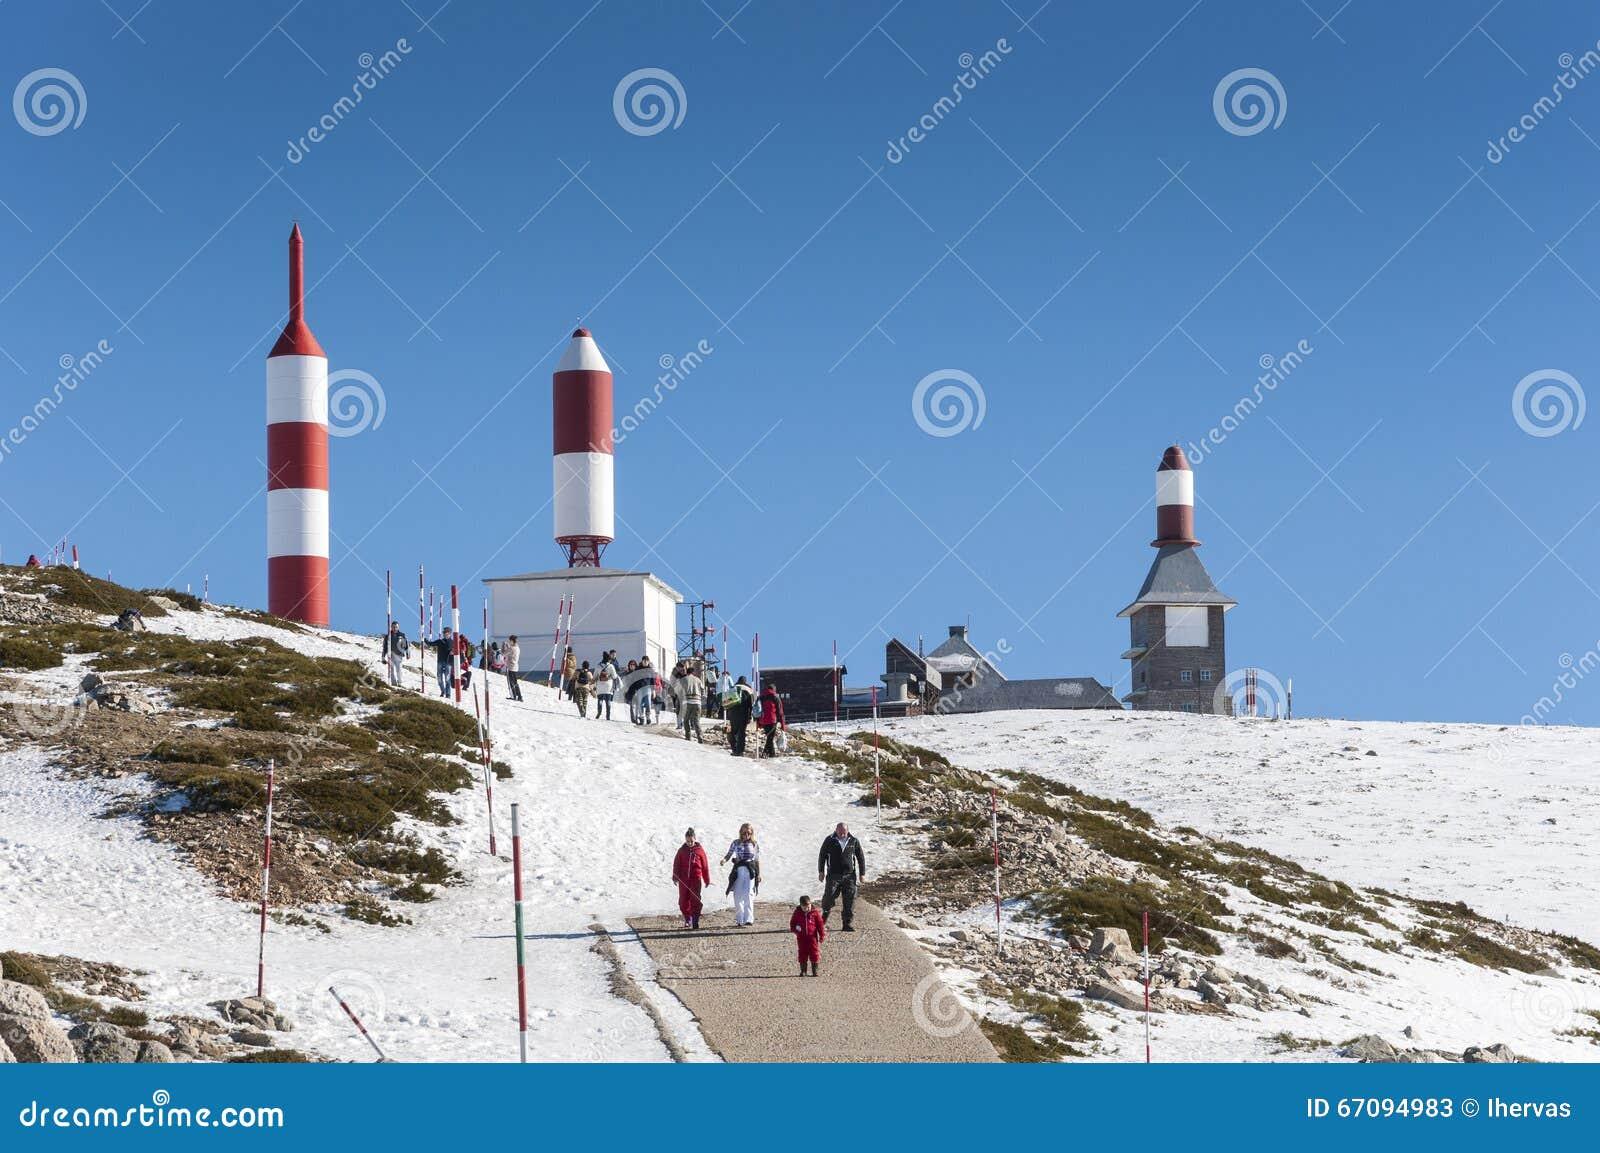 Navacerrada Ski Resort Foto de Stock Editorial - Imagem ...